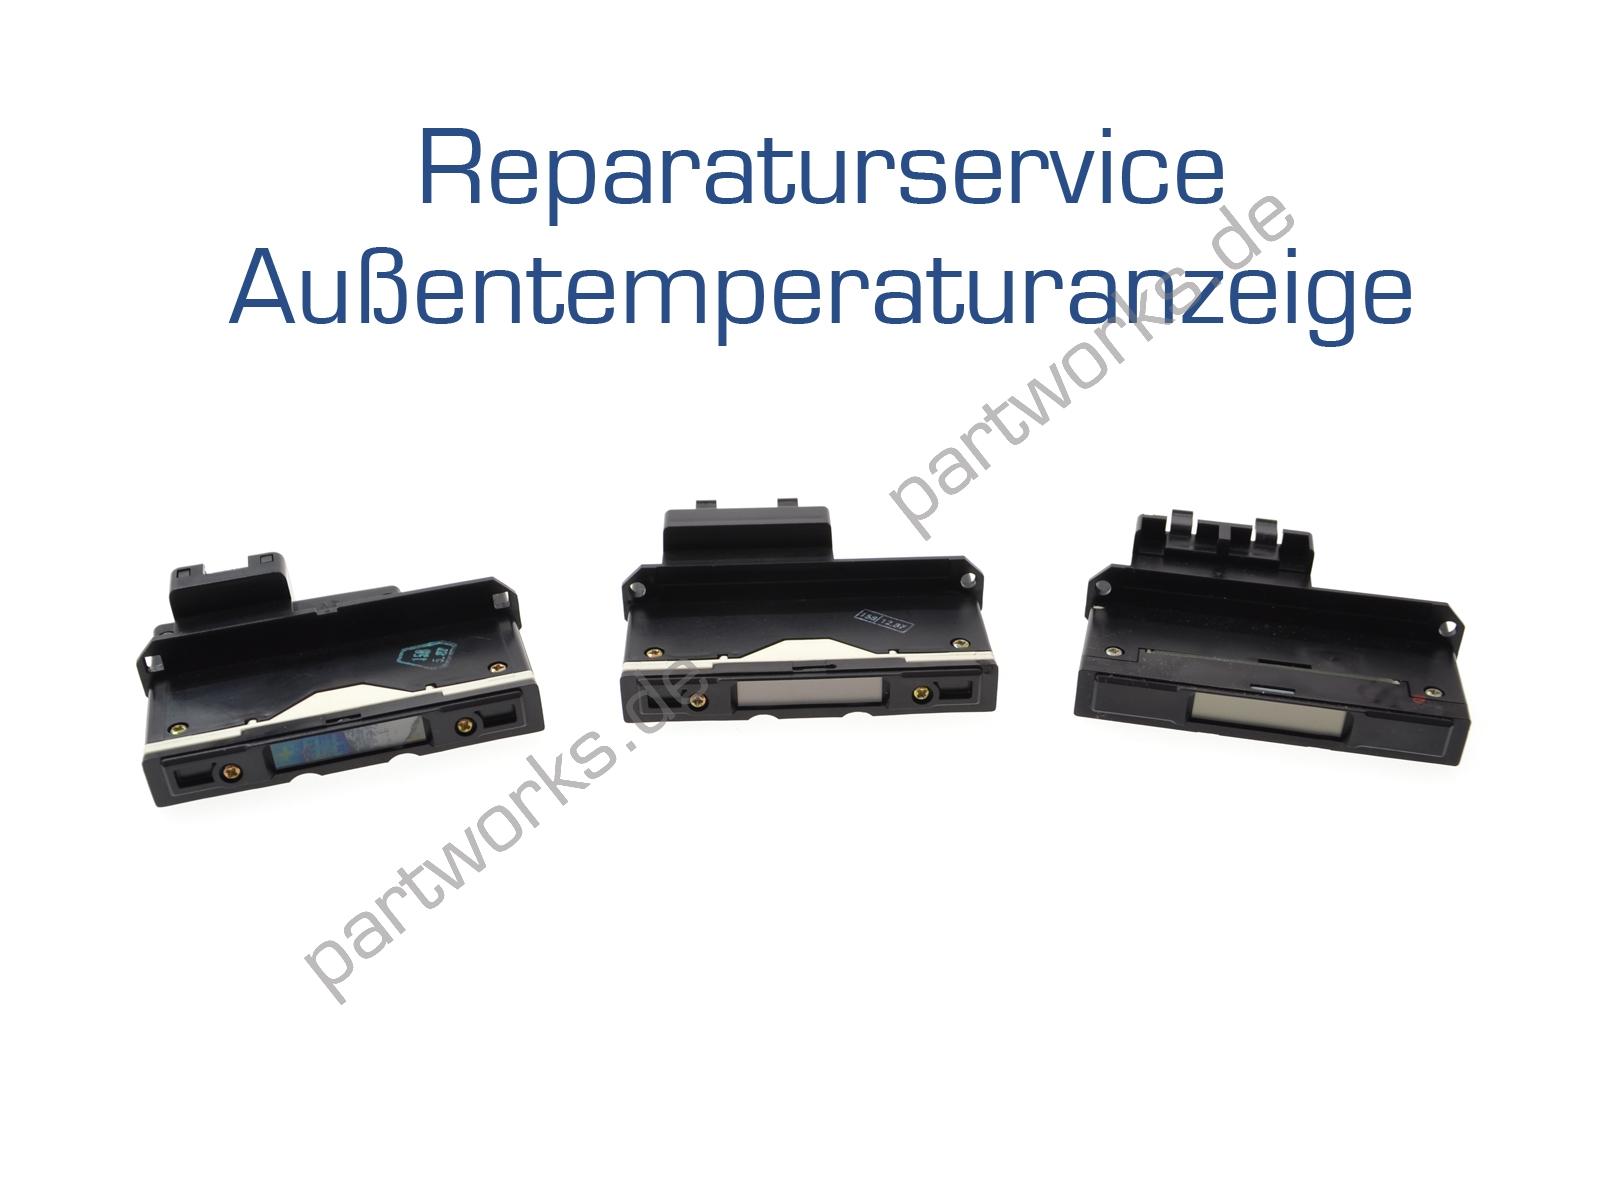 Reparaturservice für Mercedes W124/W201/W126/W463 ATA